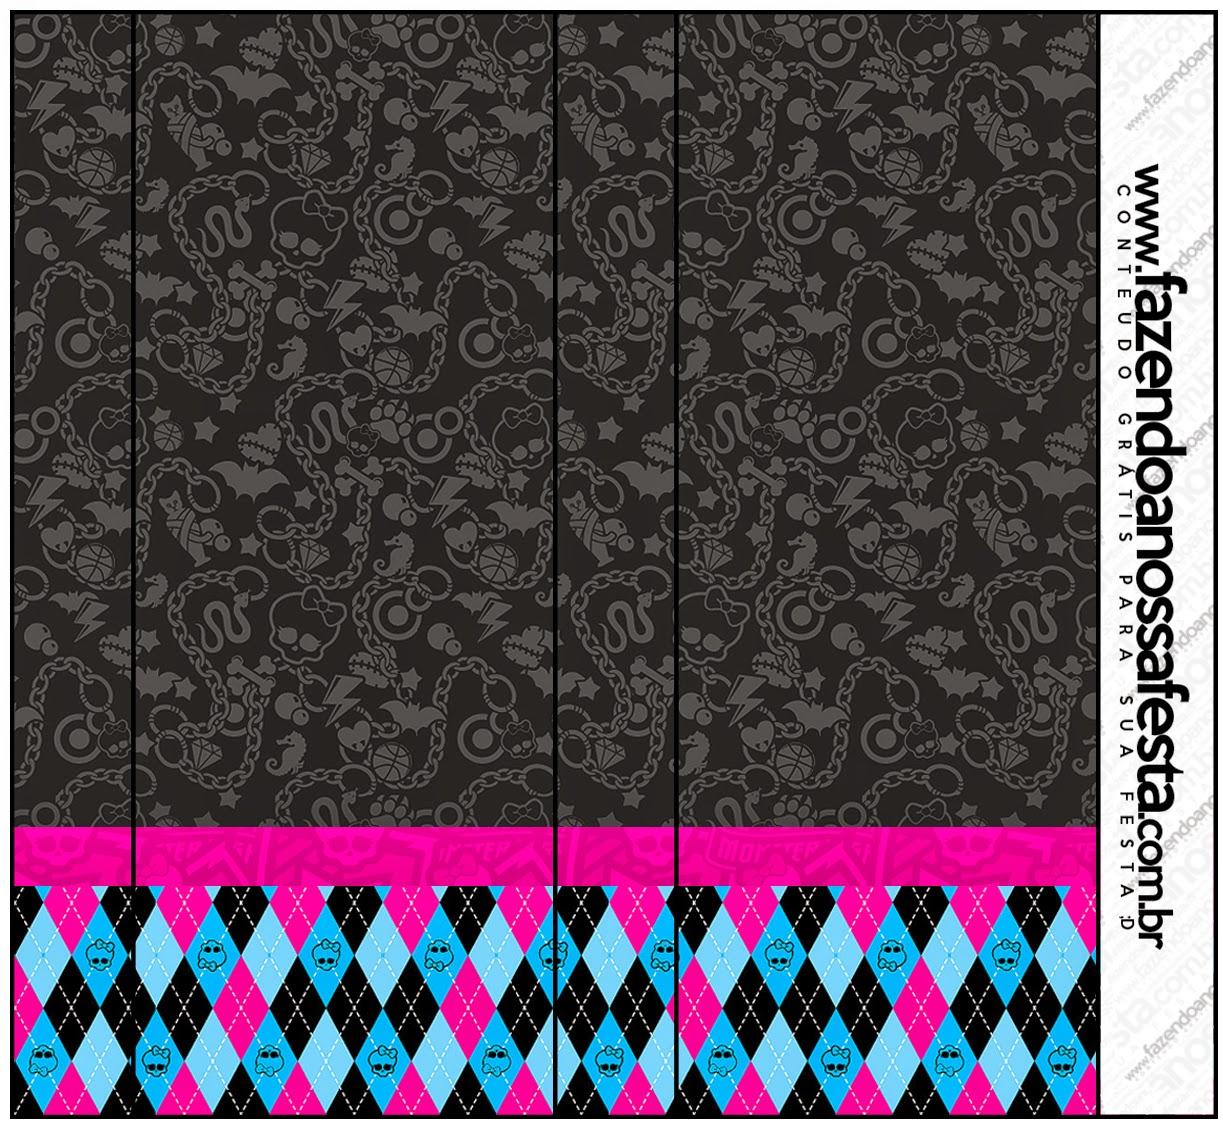 Etiquetas de Monster High Negro para imprimir gratis.